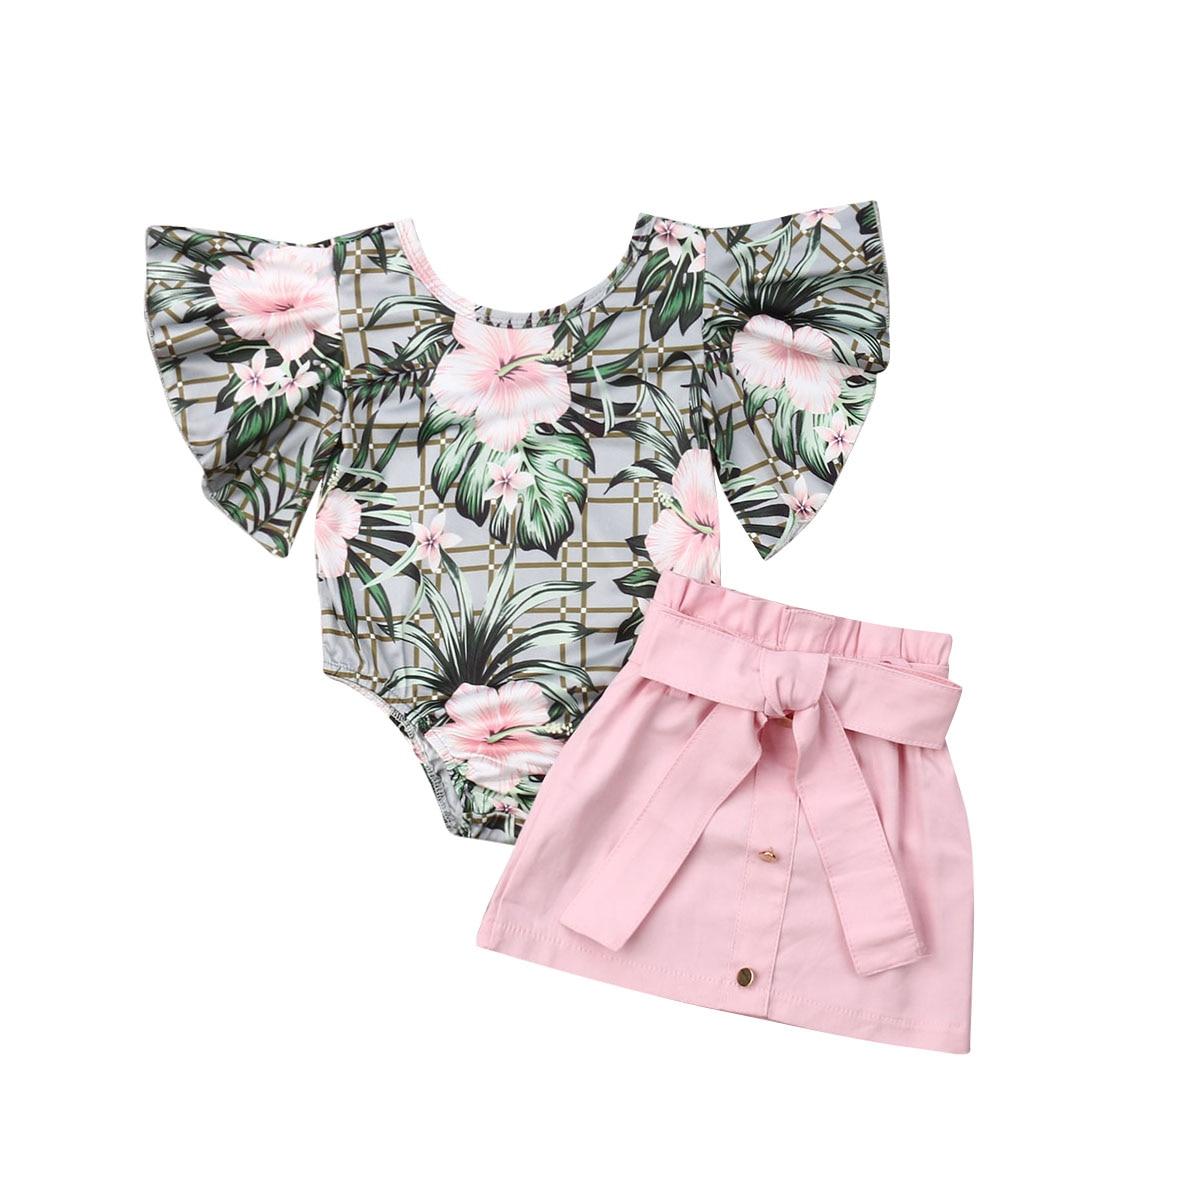 1-4T Toddler Sweet Infant Baby Girl Clothes Set Summer Clothes Flower Fly-Sleeve Romper Tops+Pink Belt Skirt Dress Outfit Set